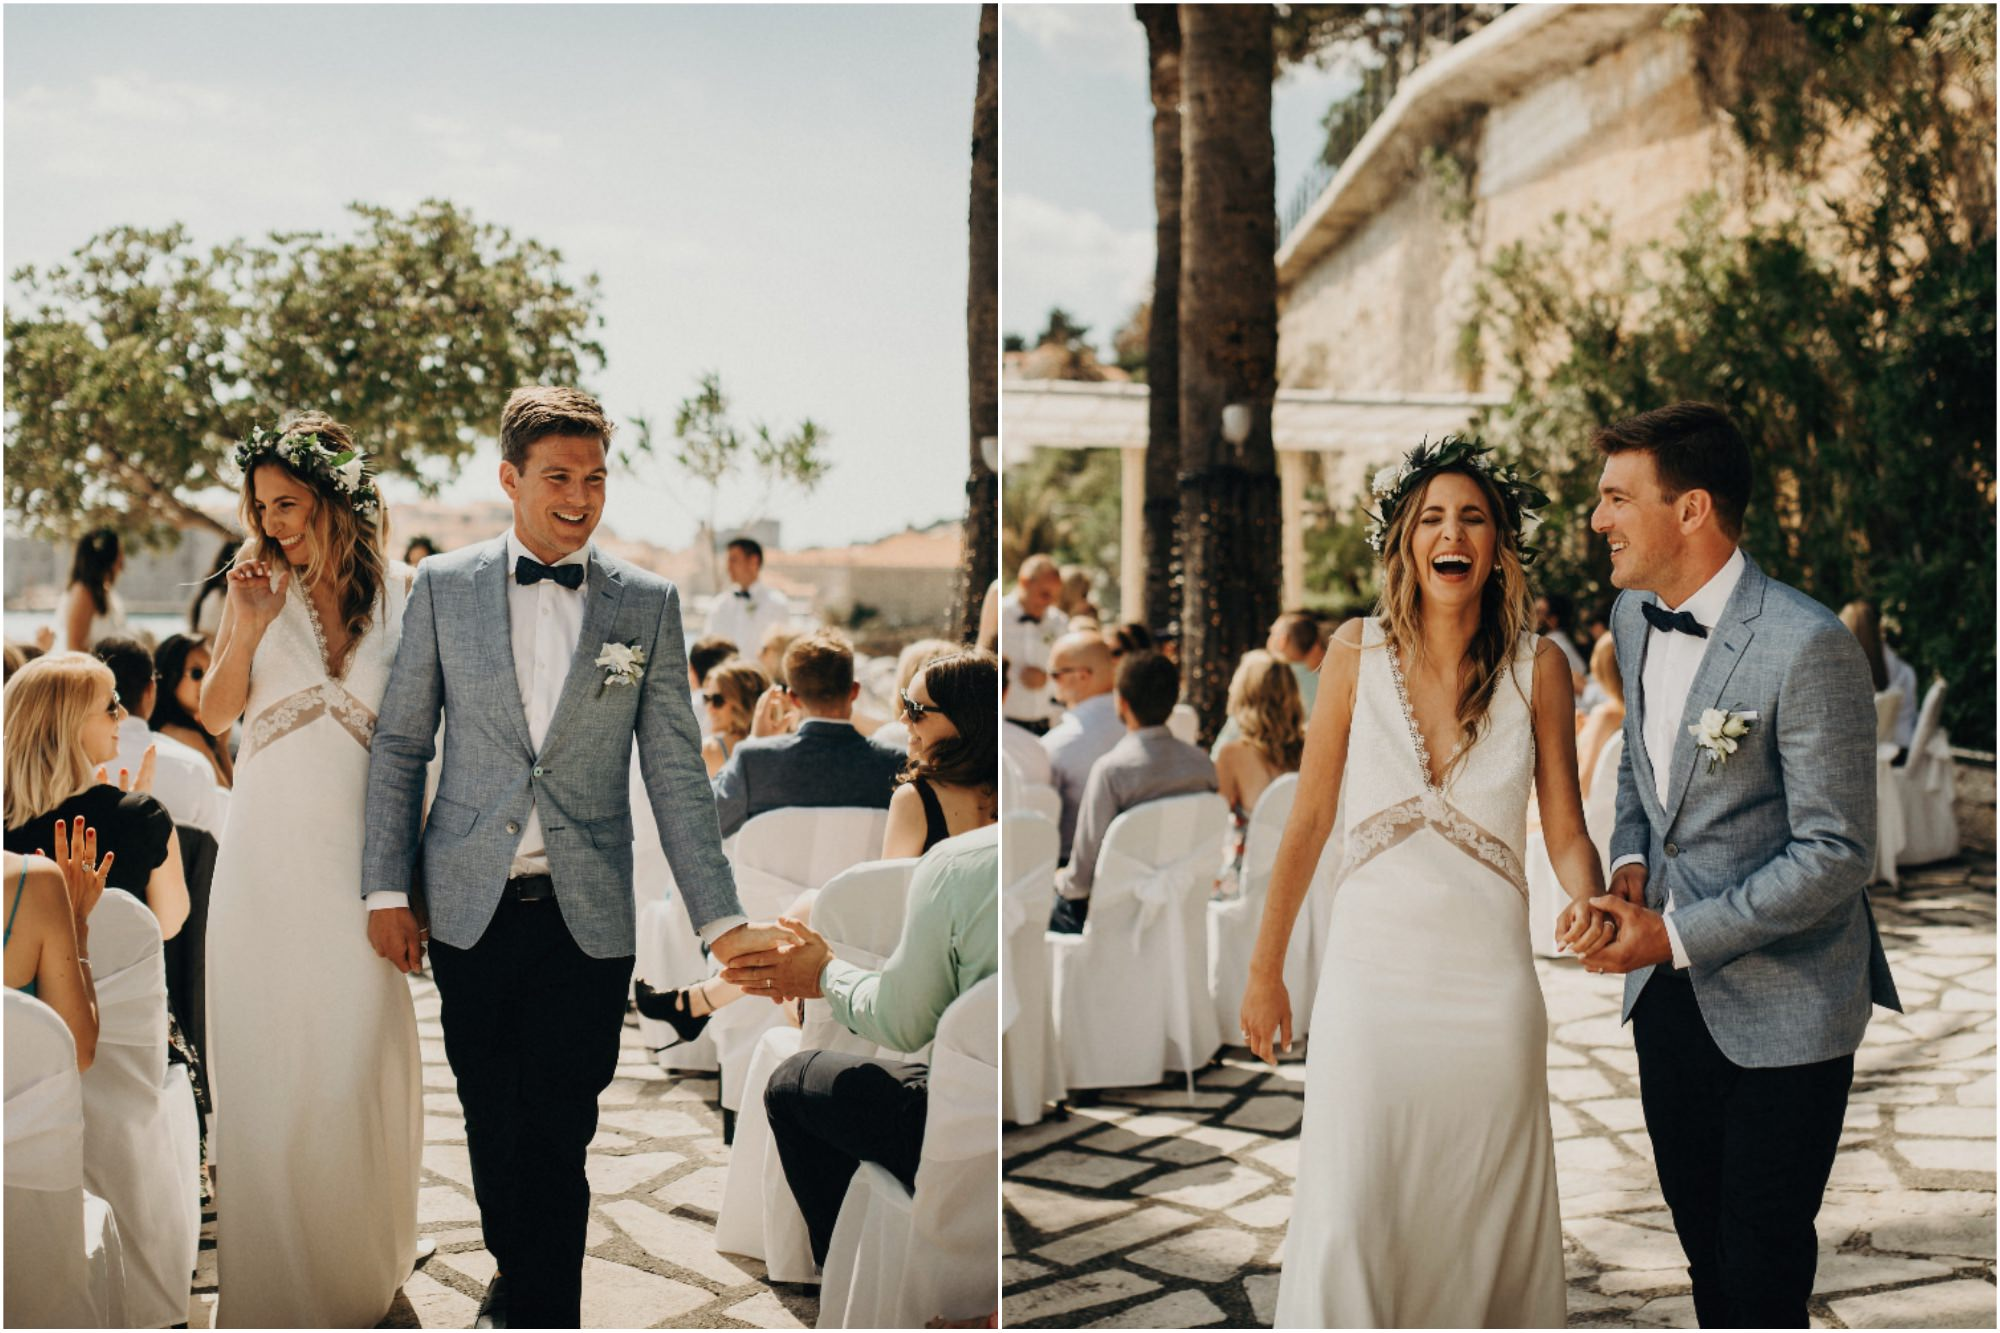 dubrovnik_croatia_wedding_photographer-jere_satamo-destination_weddings-043-web.jpg